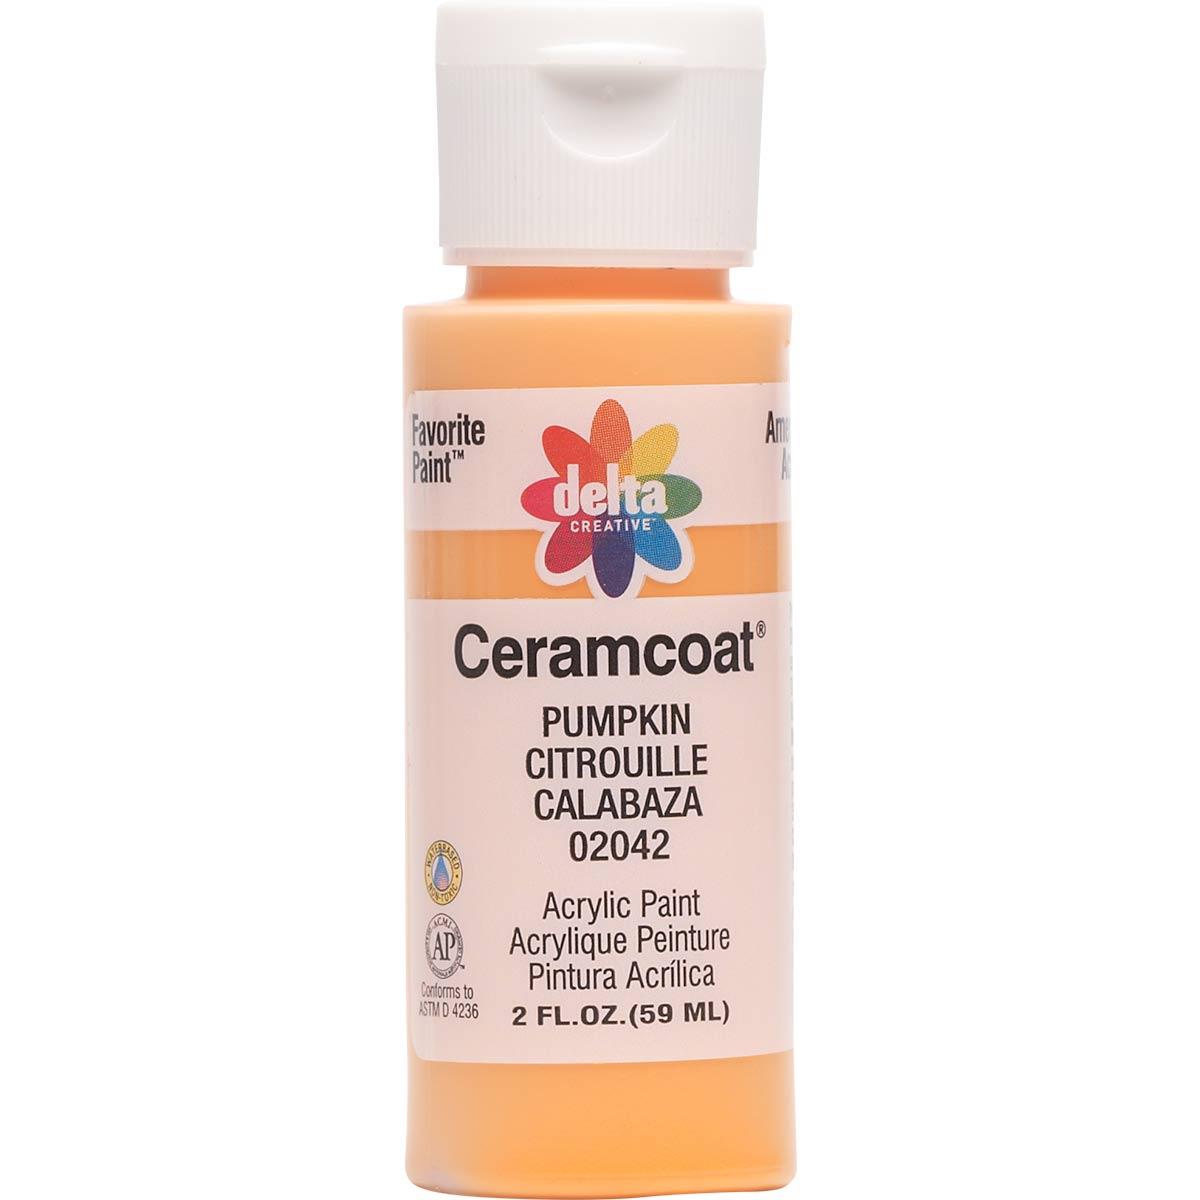 Delta Ceramcoat ® Acrylic Paint - Pumpkin, 2 oz. - 020420202W